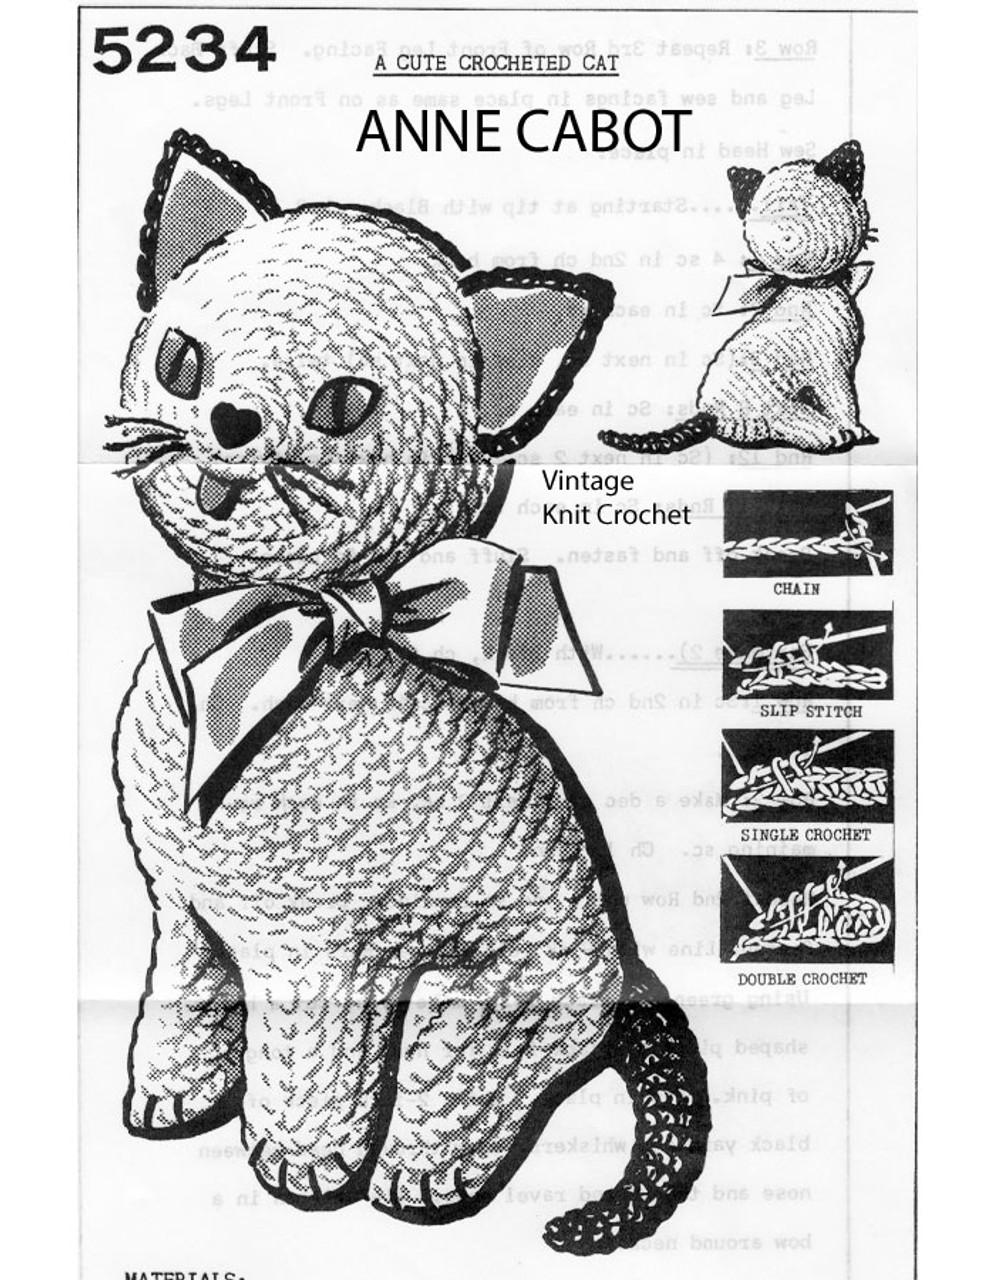 Crochet Cat stuffed toy pattern, Anne Cabot 5234